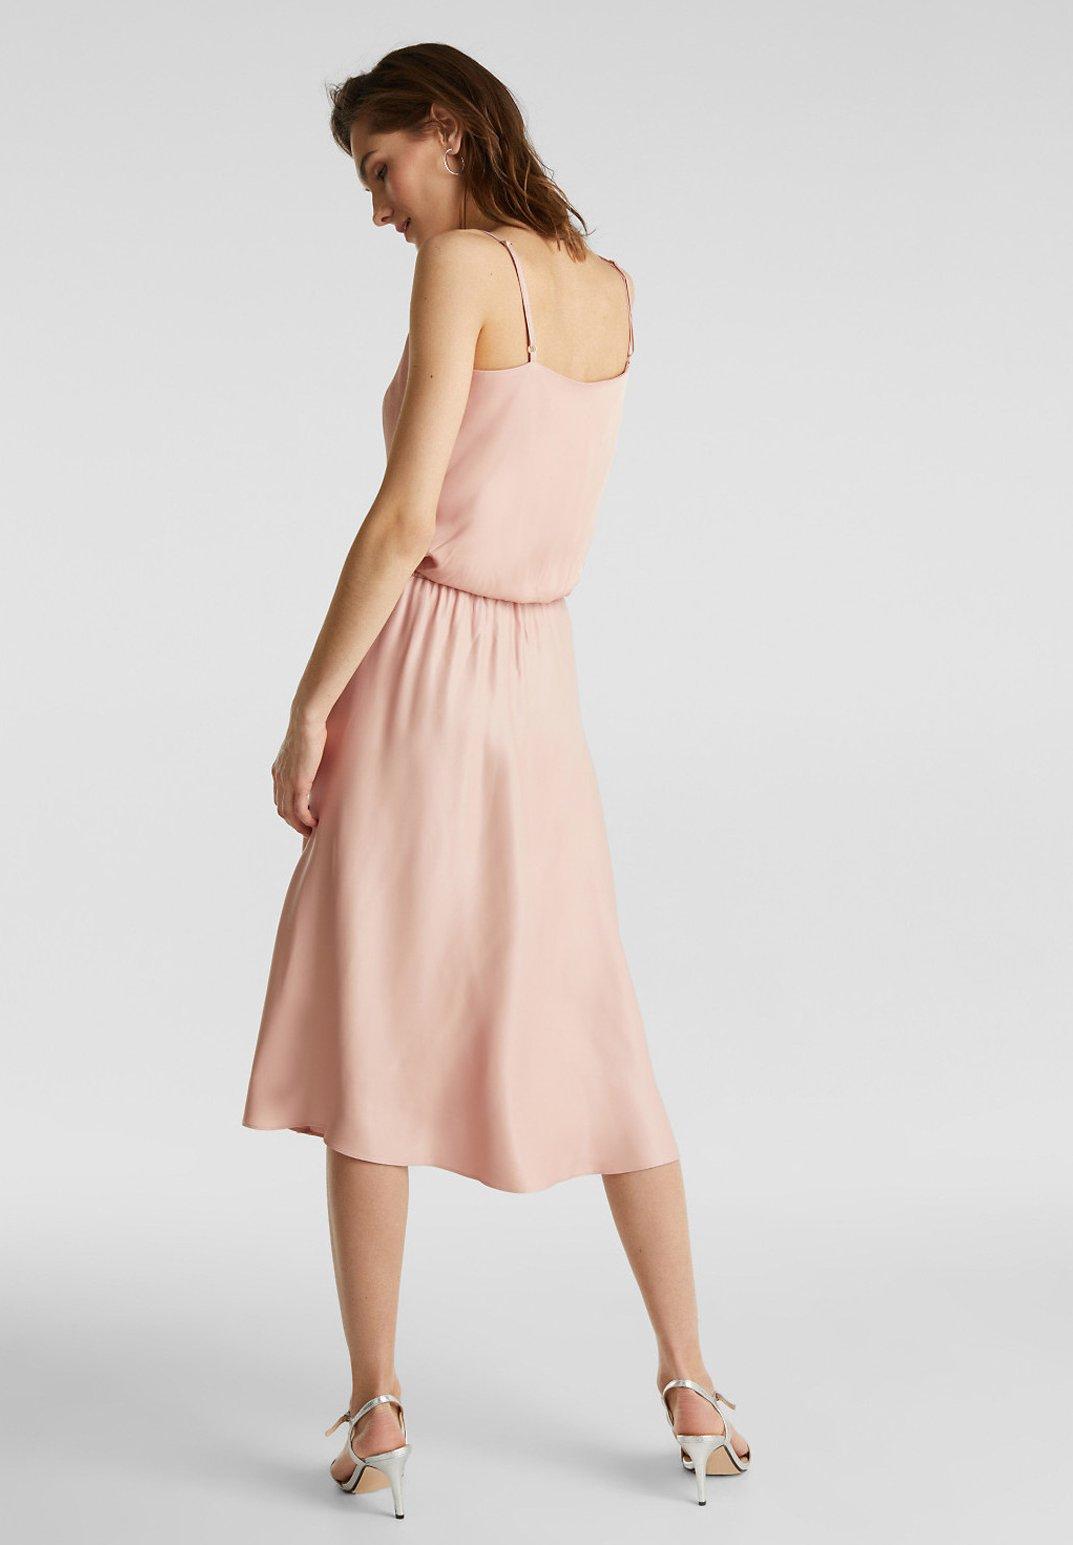 Esprit Collection Sateen Max Skirt - A-snit Nederdel/ A-formede Nederdele Nude